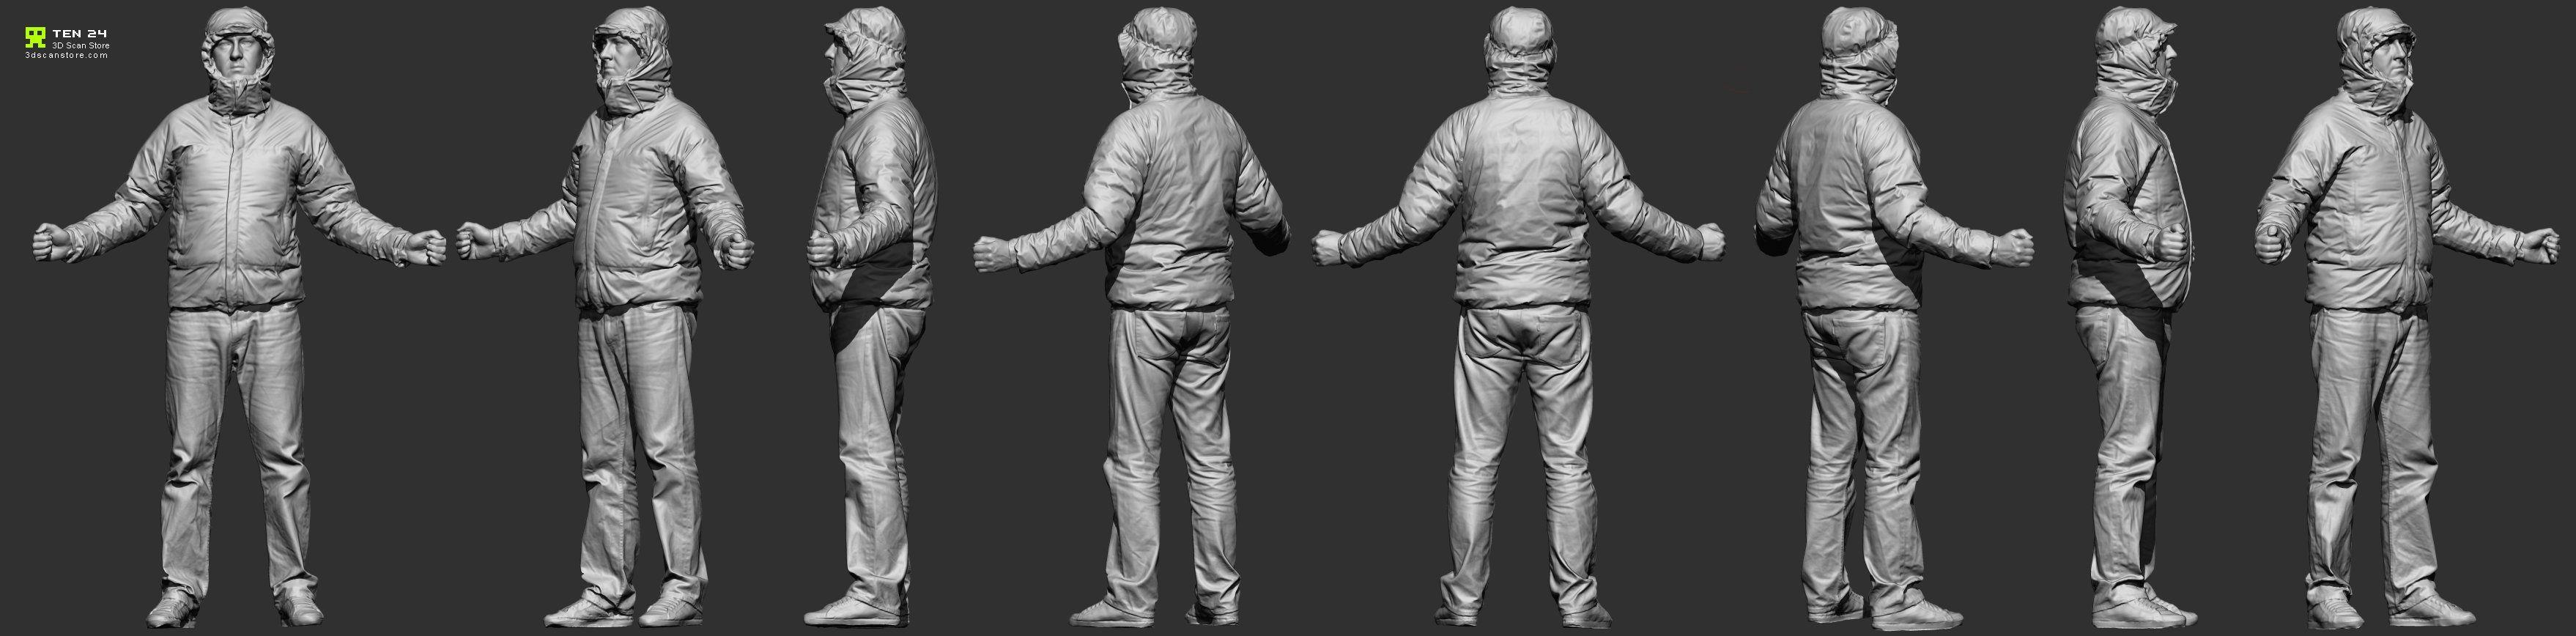 Full Body Scan 21.jpg (3516×868) | Anatomy: 3D Scans: Male | Pinterest